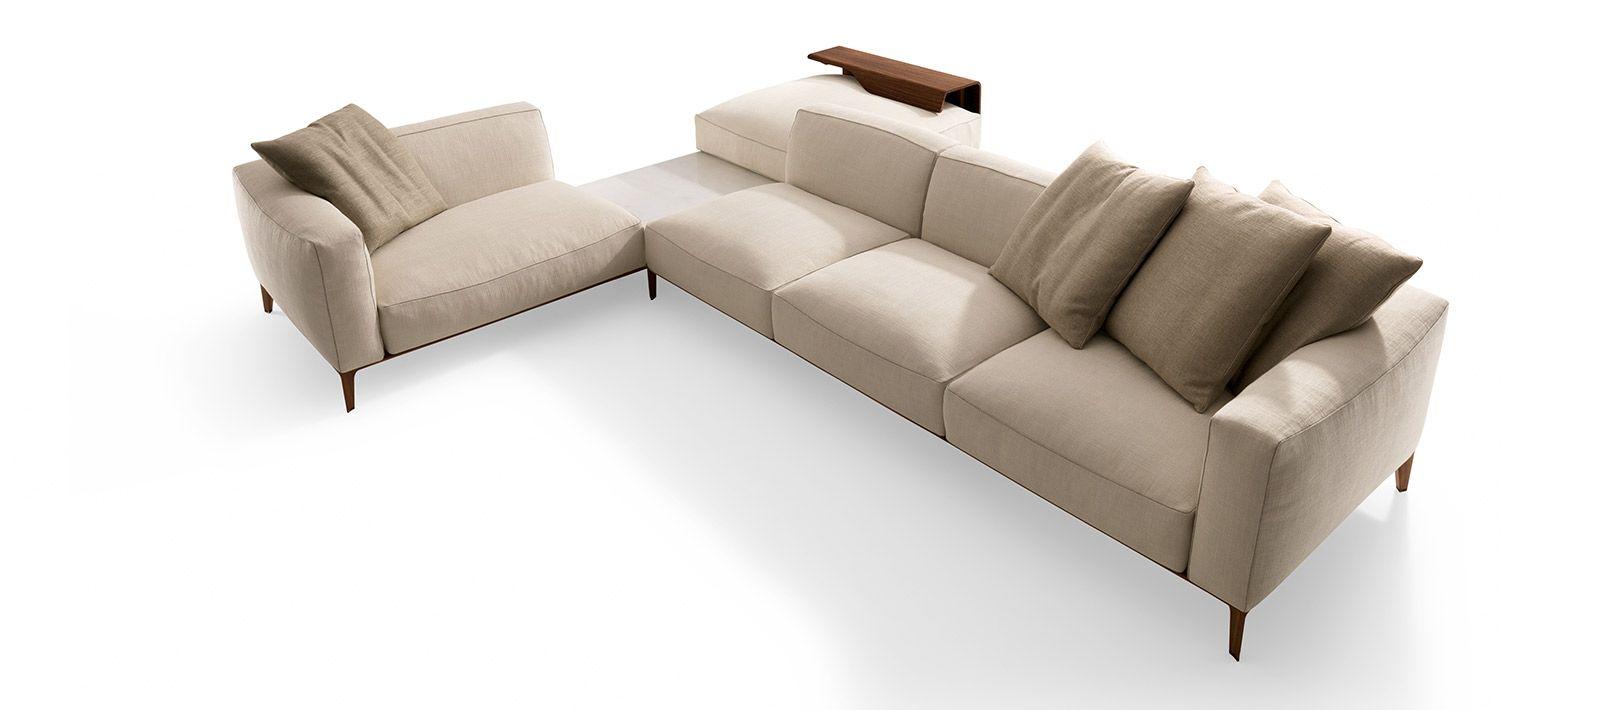 Aton Sectional Sofa, Furniture, Luxury